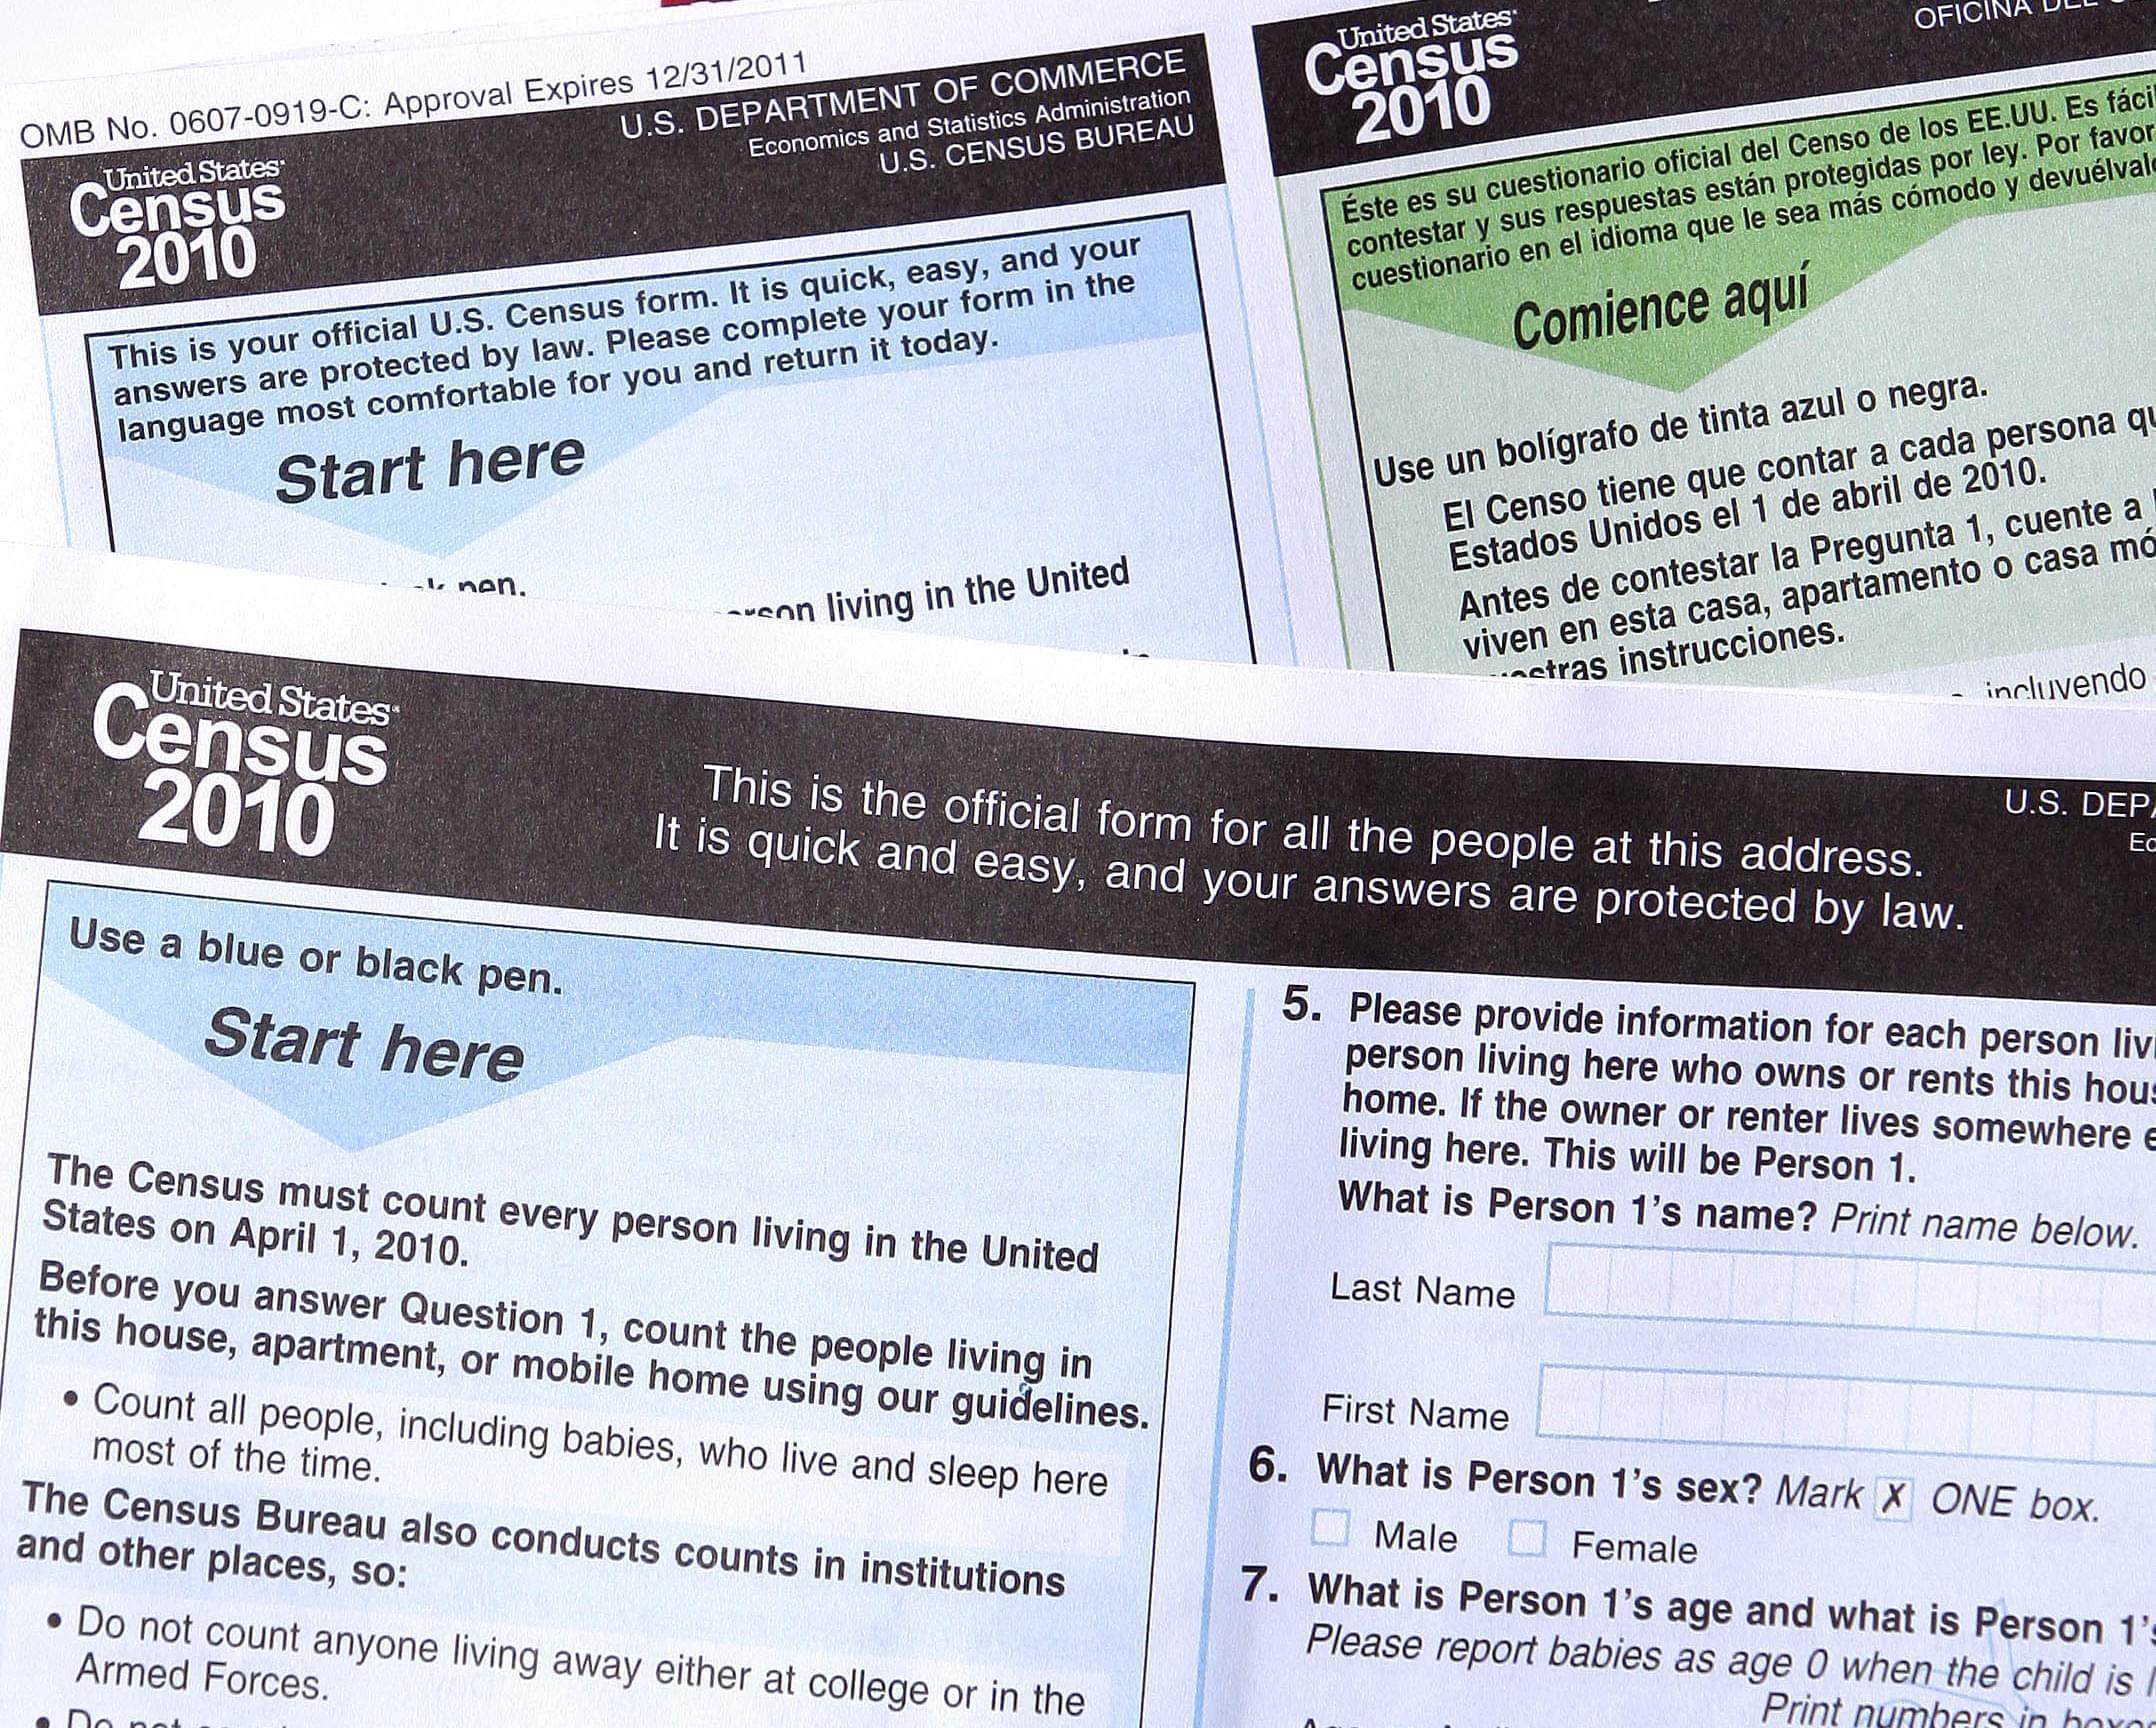 Census Bureau forms